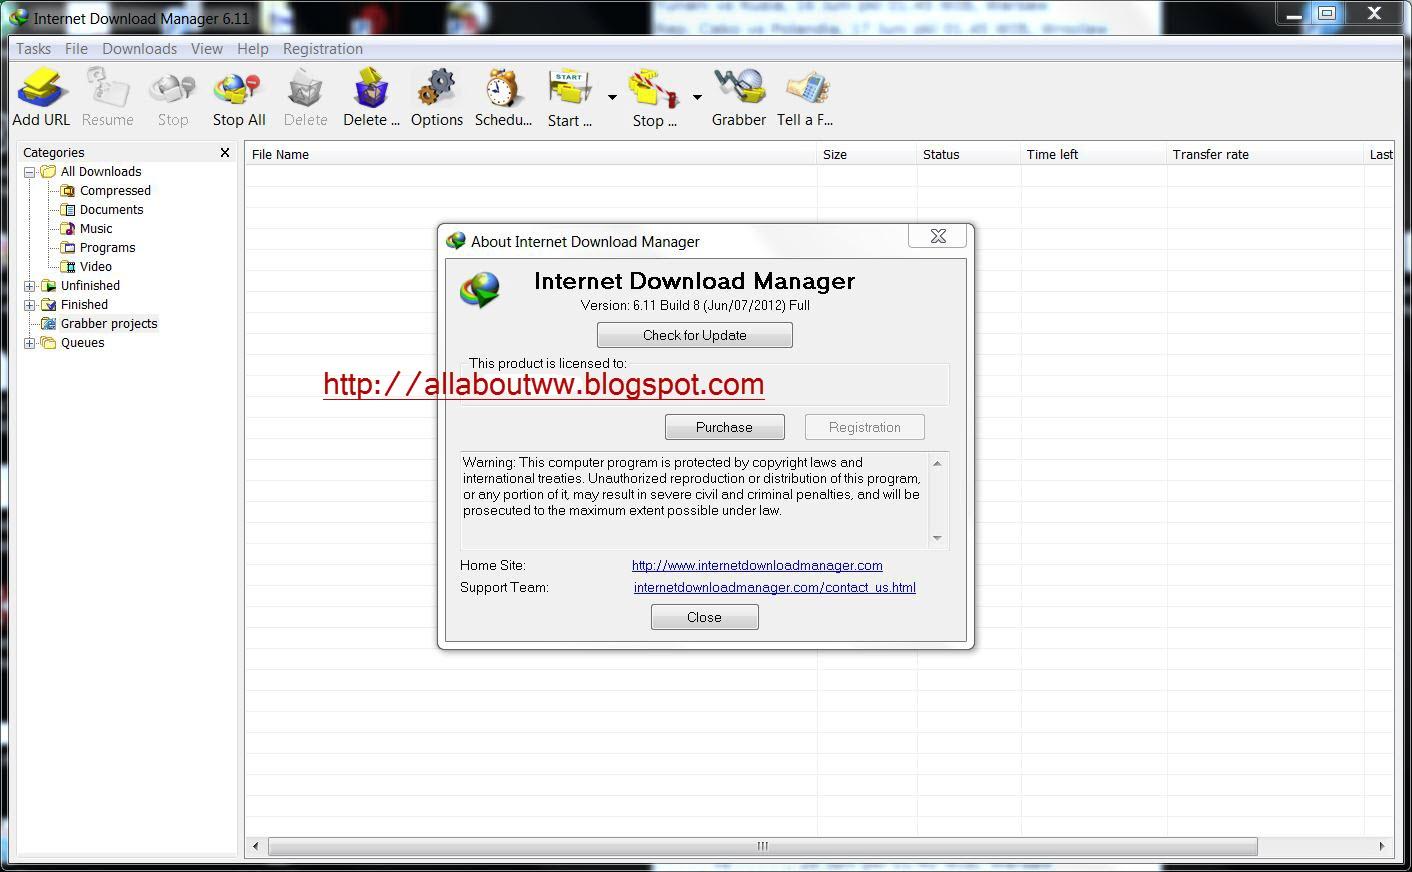 Idm 611 patch download websites - pakcirclescom